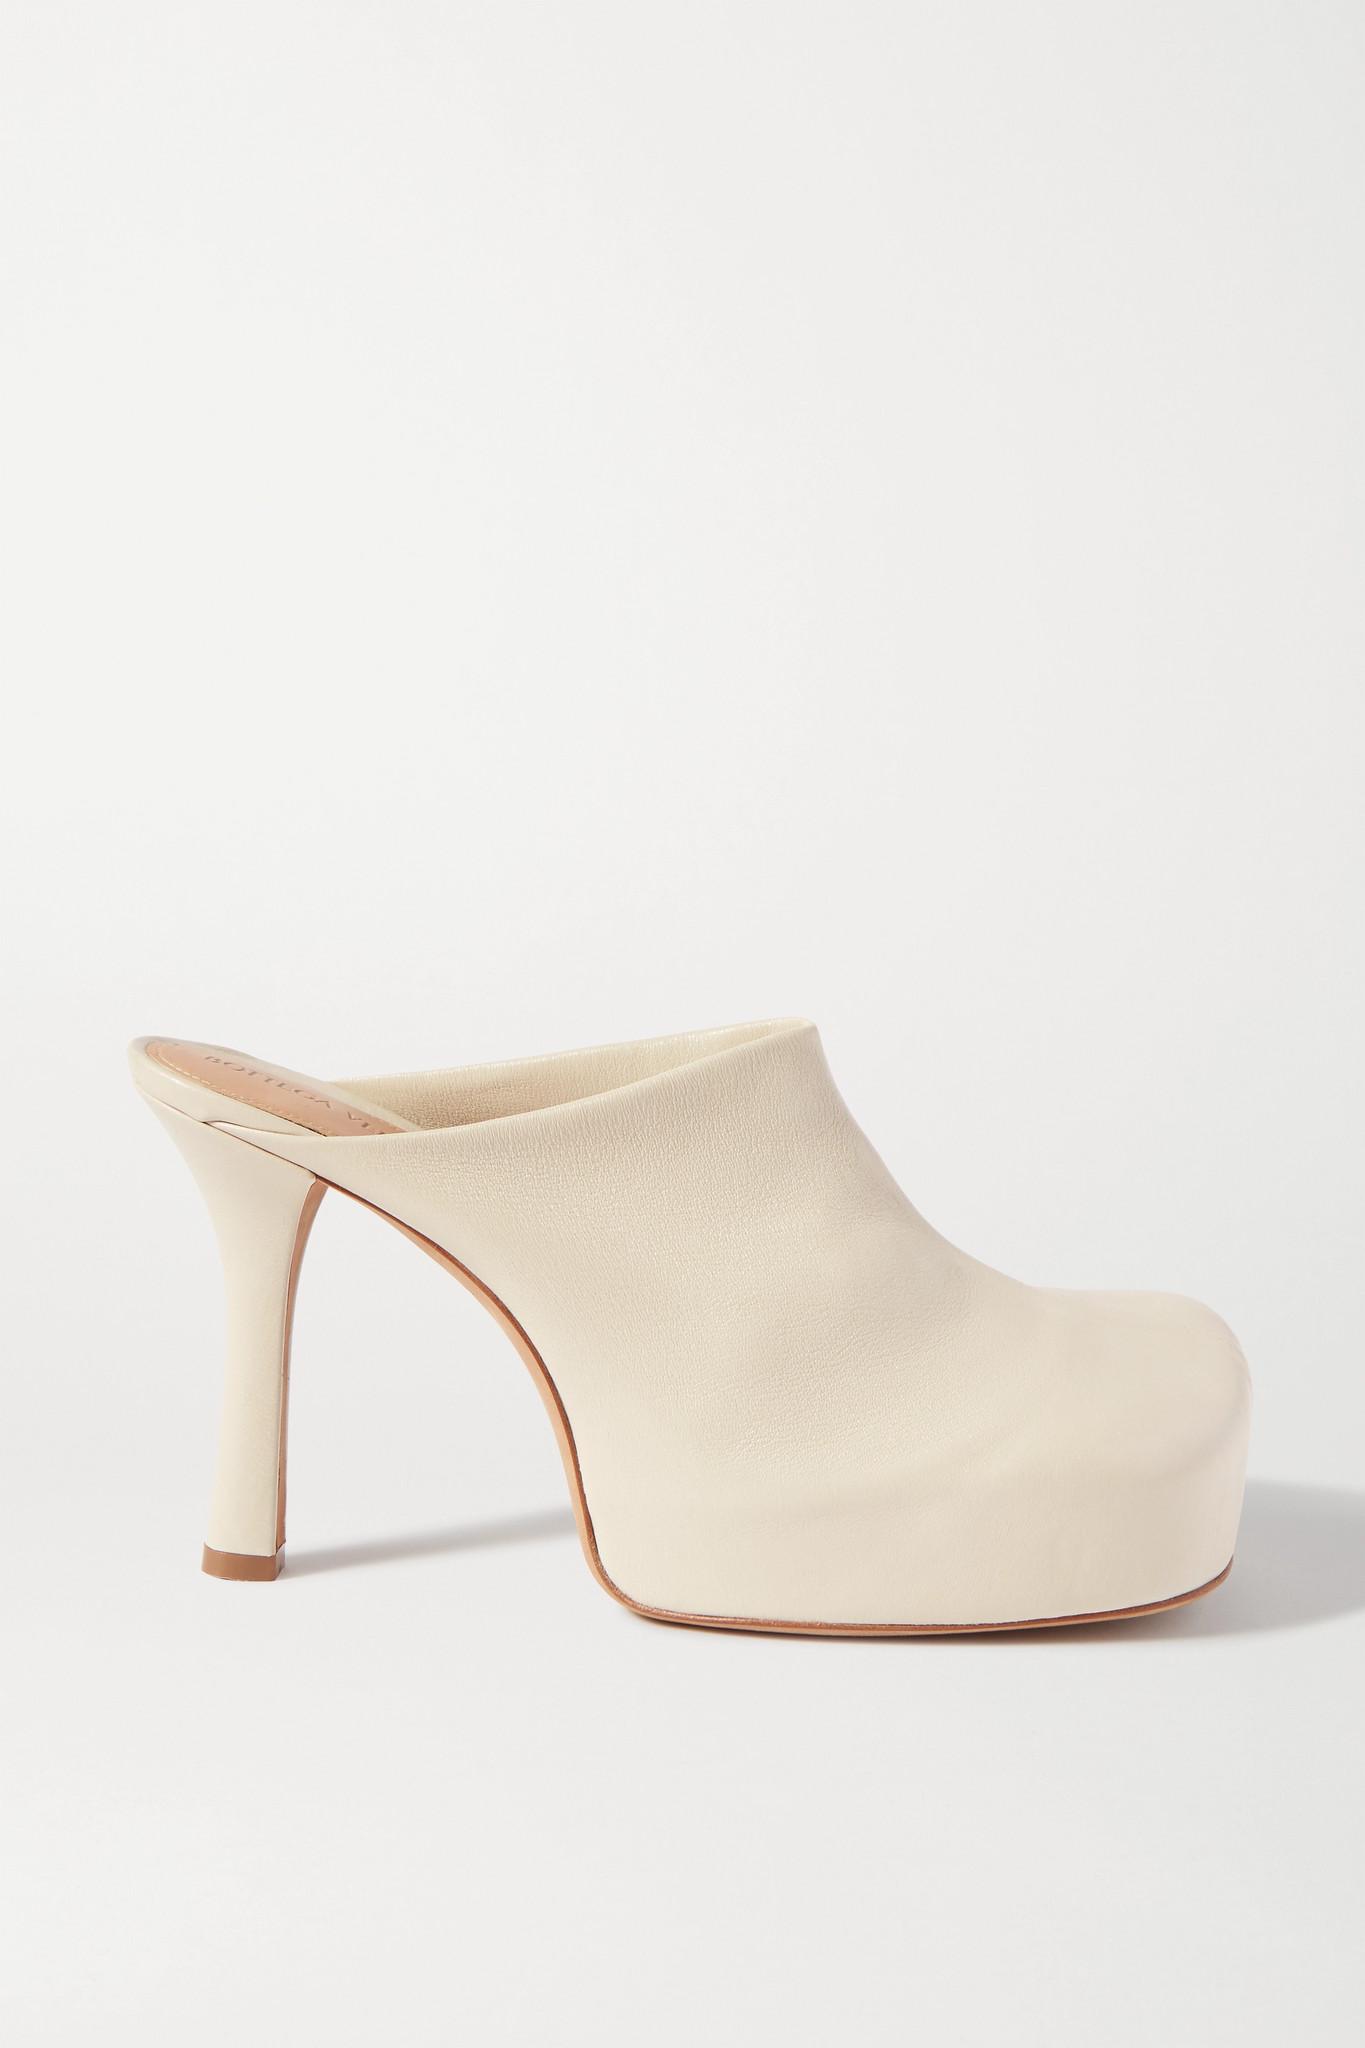 BOTTEGA VENETA - Leather Platform Mules - Off-white - IT40